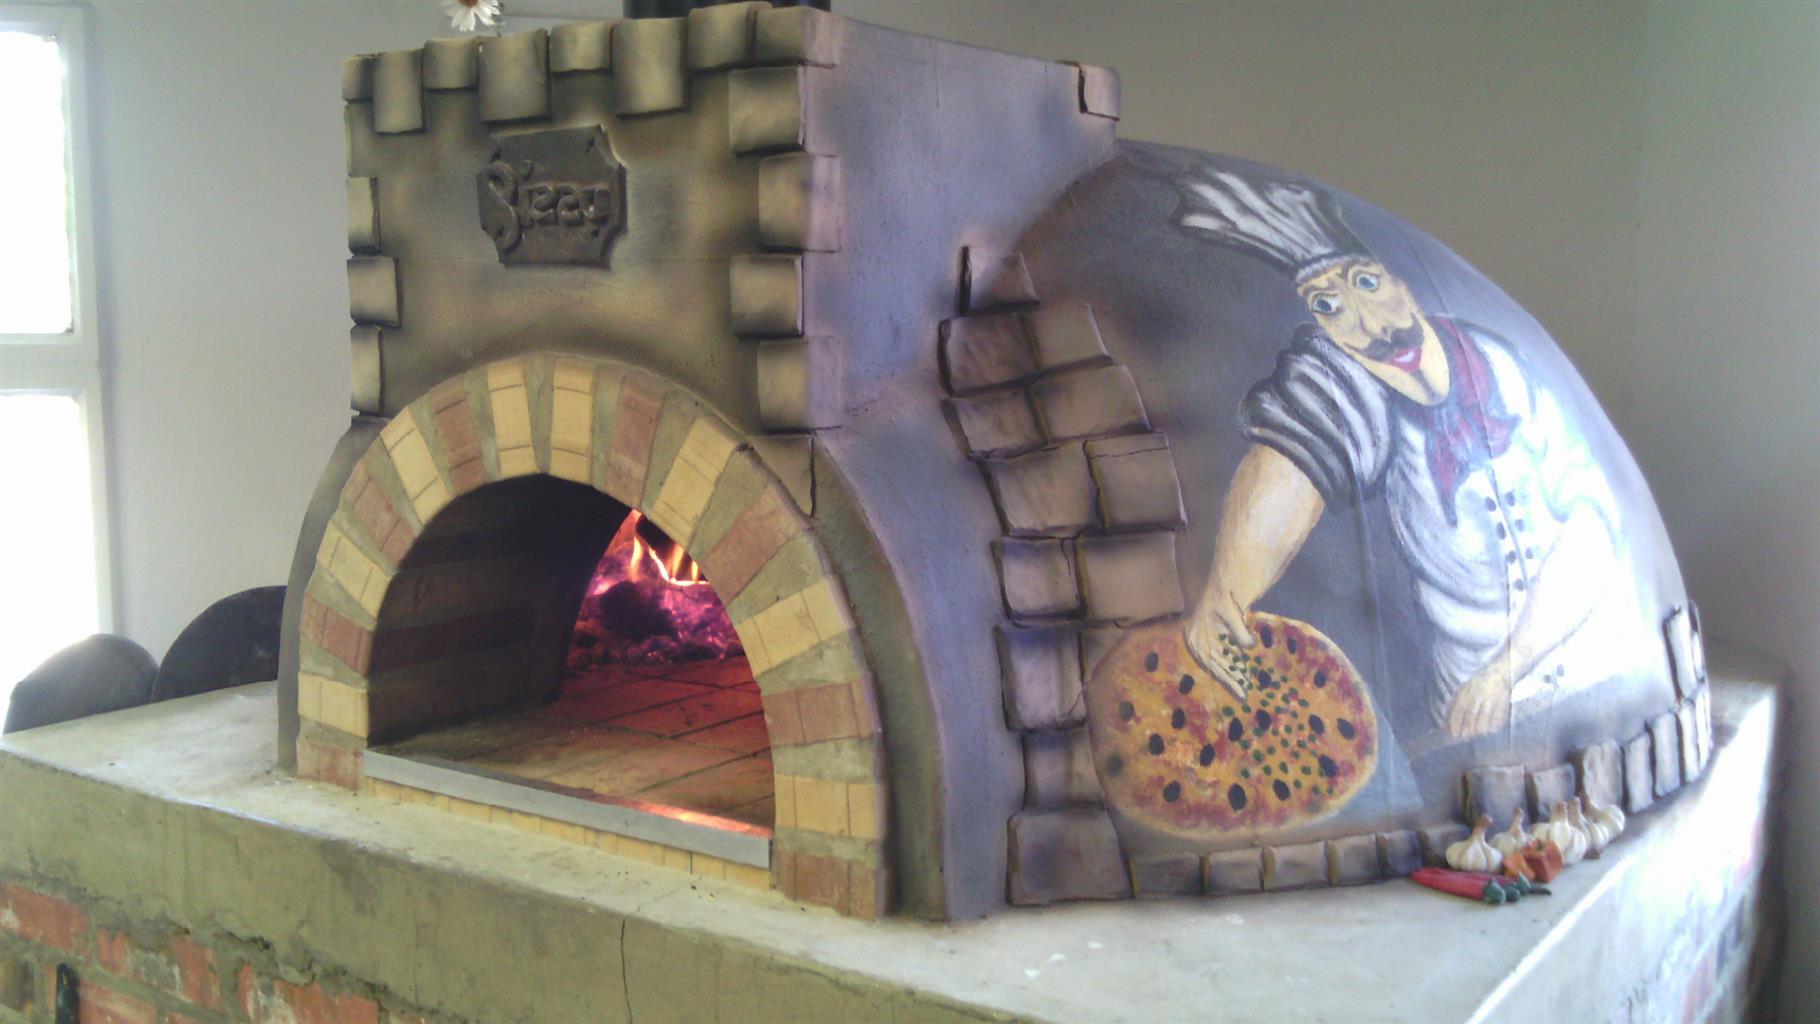 ITALIAN WOOD BURNING PIZZA OVENS